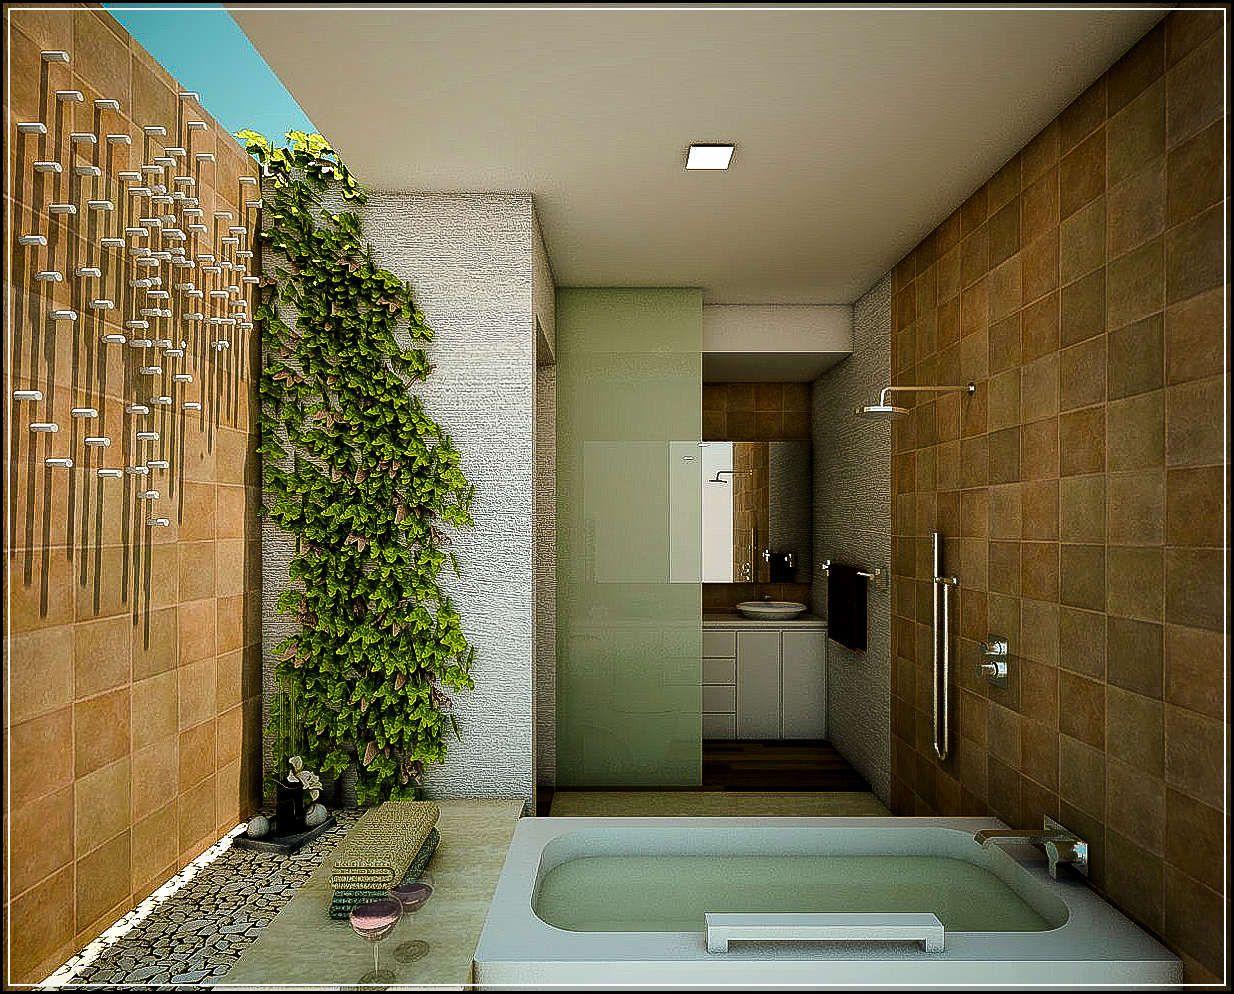 desain kamar mandi minimalis nuansa alam | house | pinterest